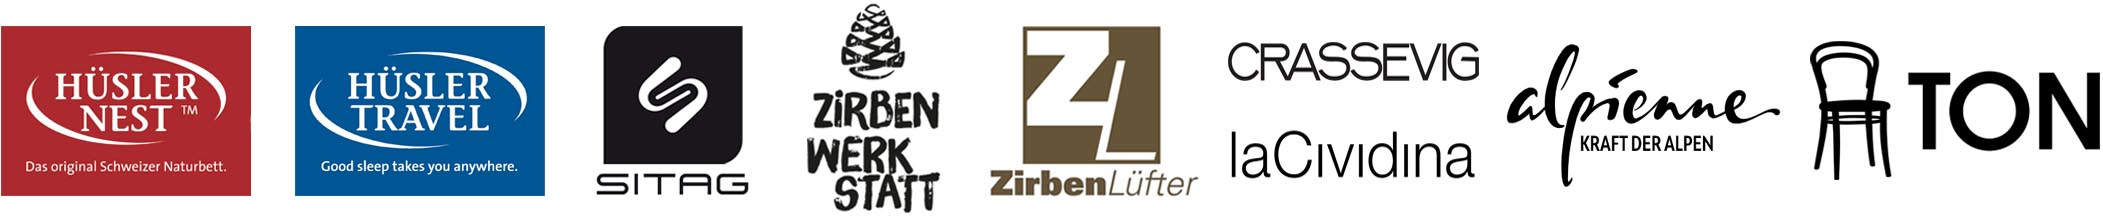 Authentigg GmbH Ruswil - Sortiment Markenlogos